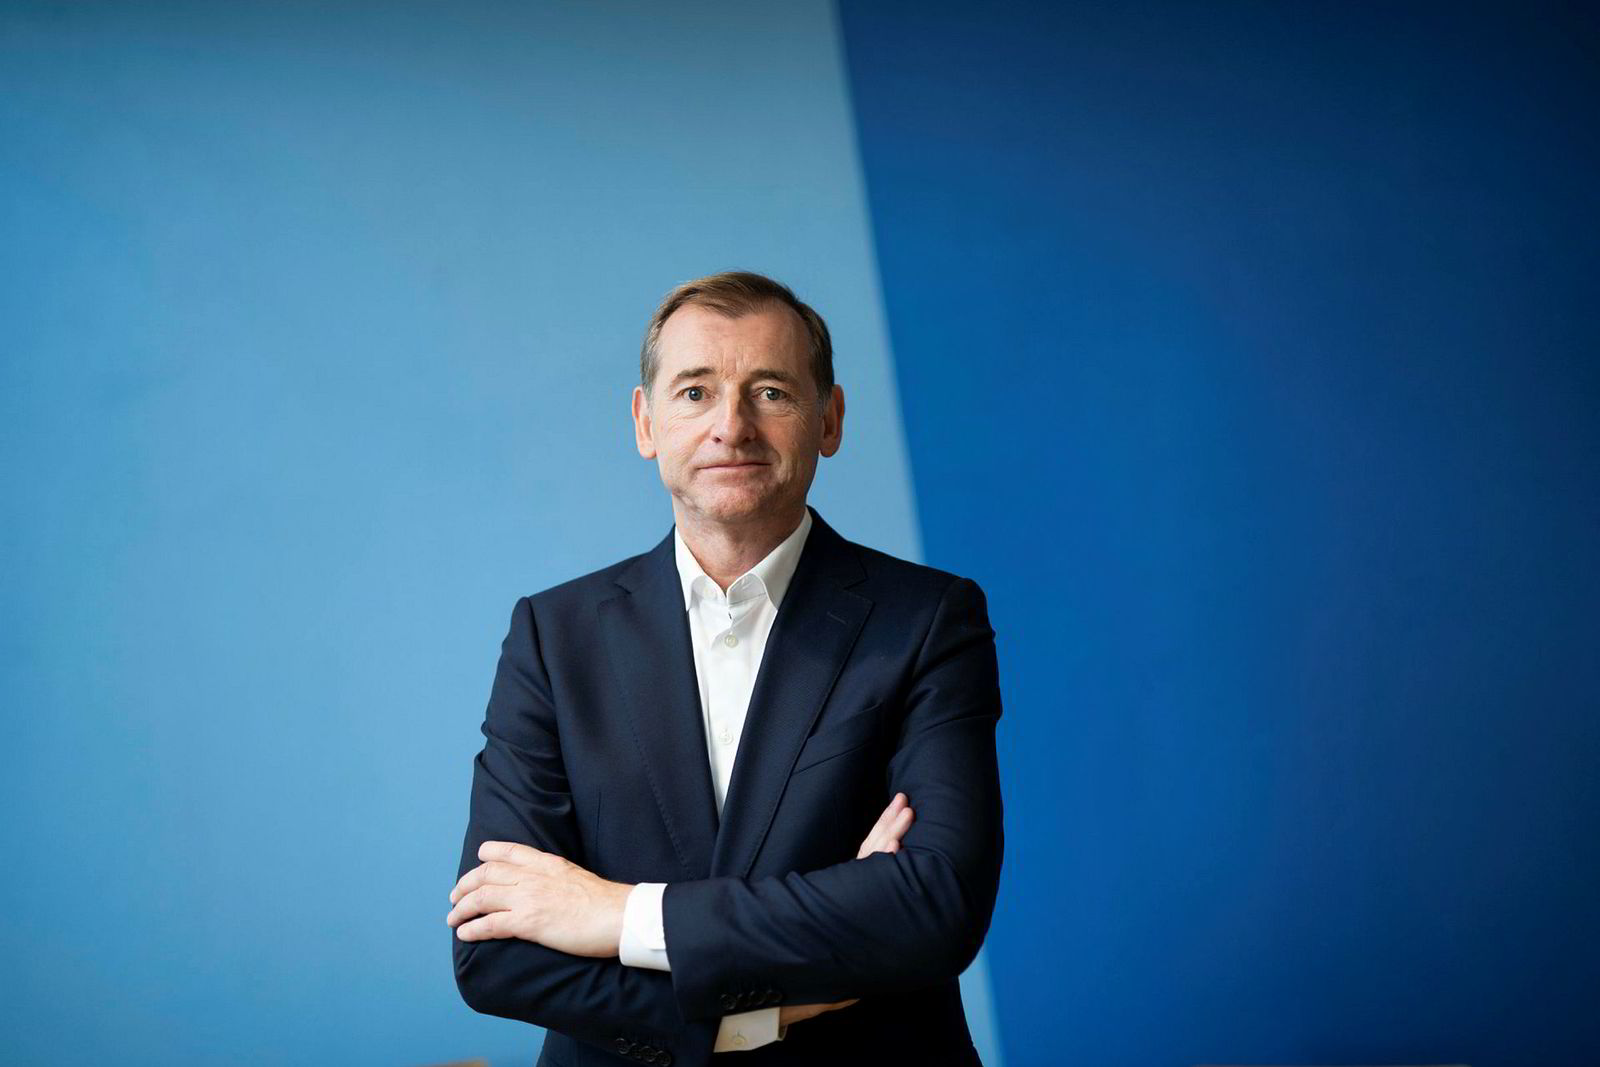 Administrerende direktør Carl Geving i Norges Eiendomsmeglerforbund